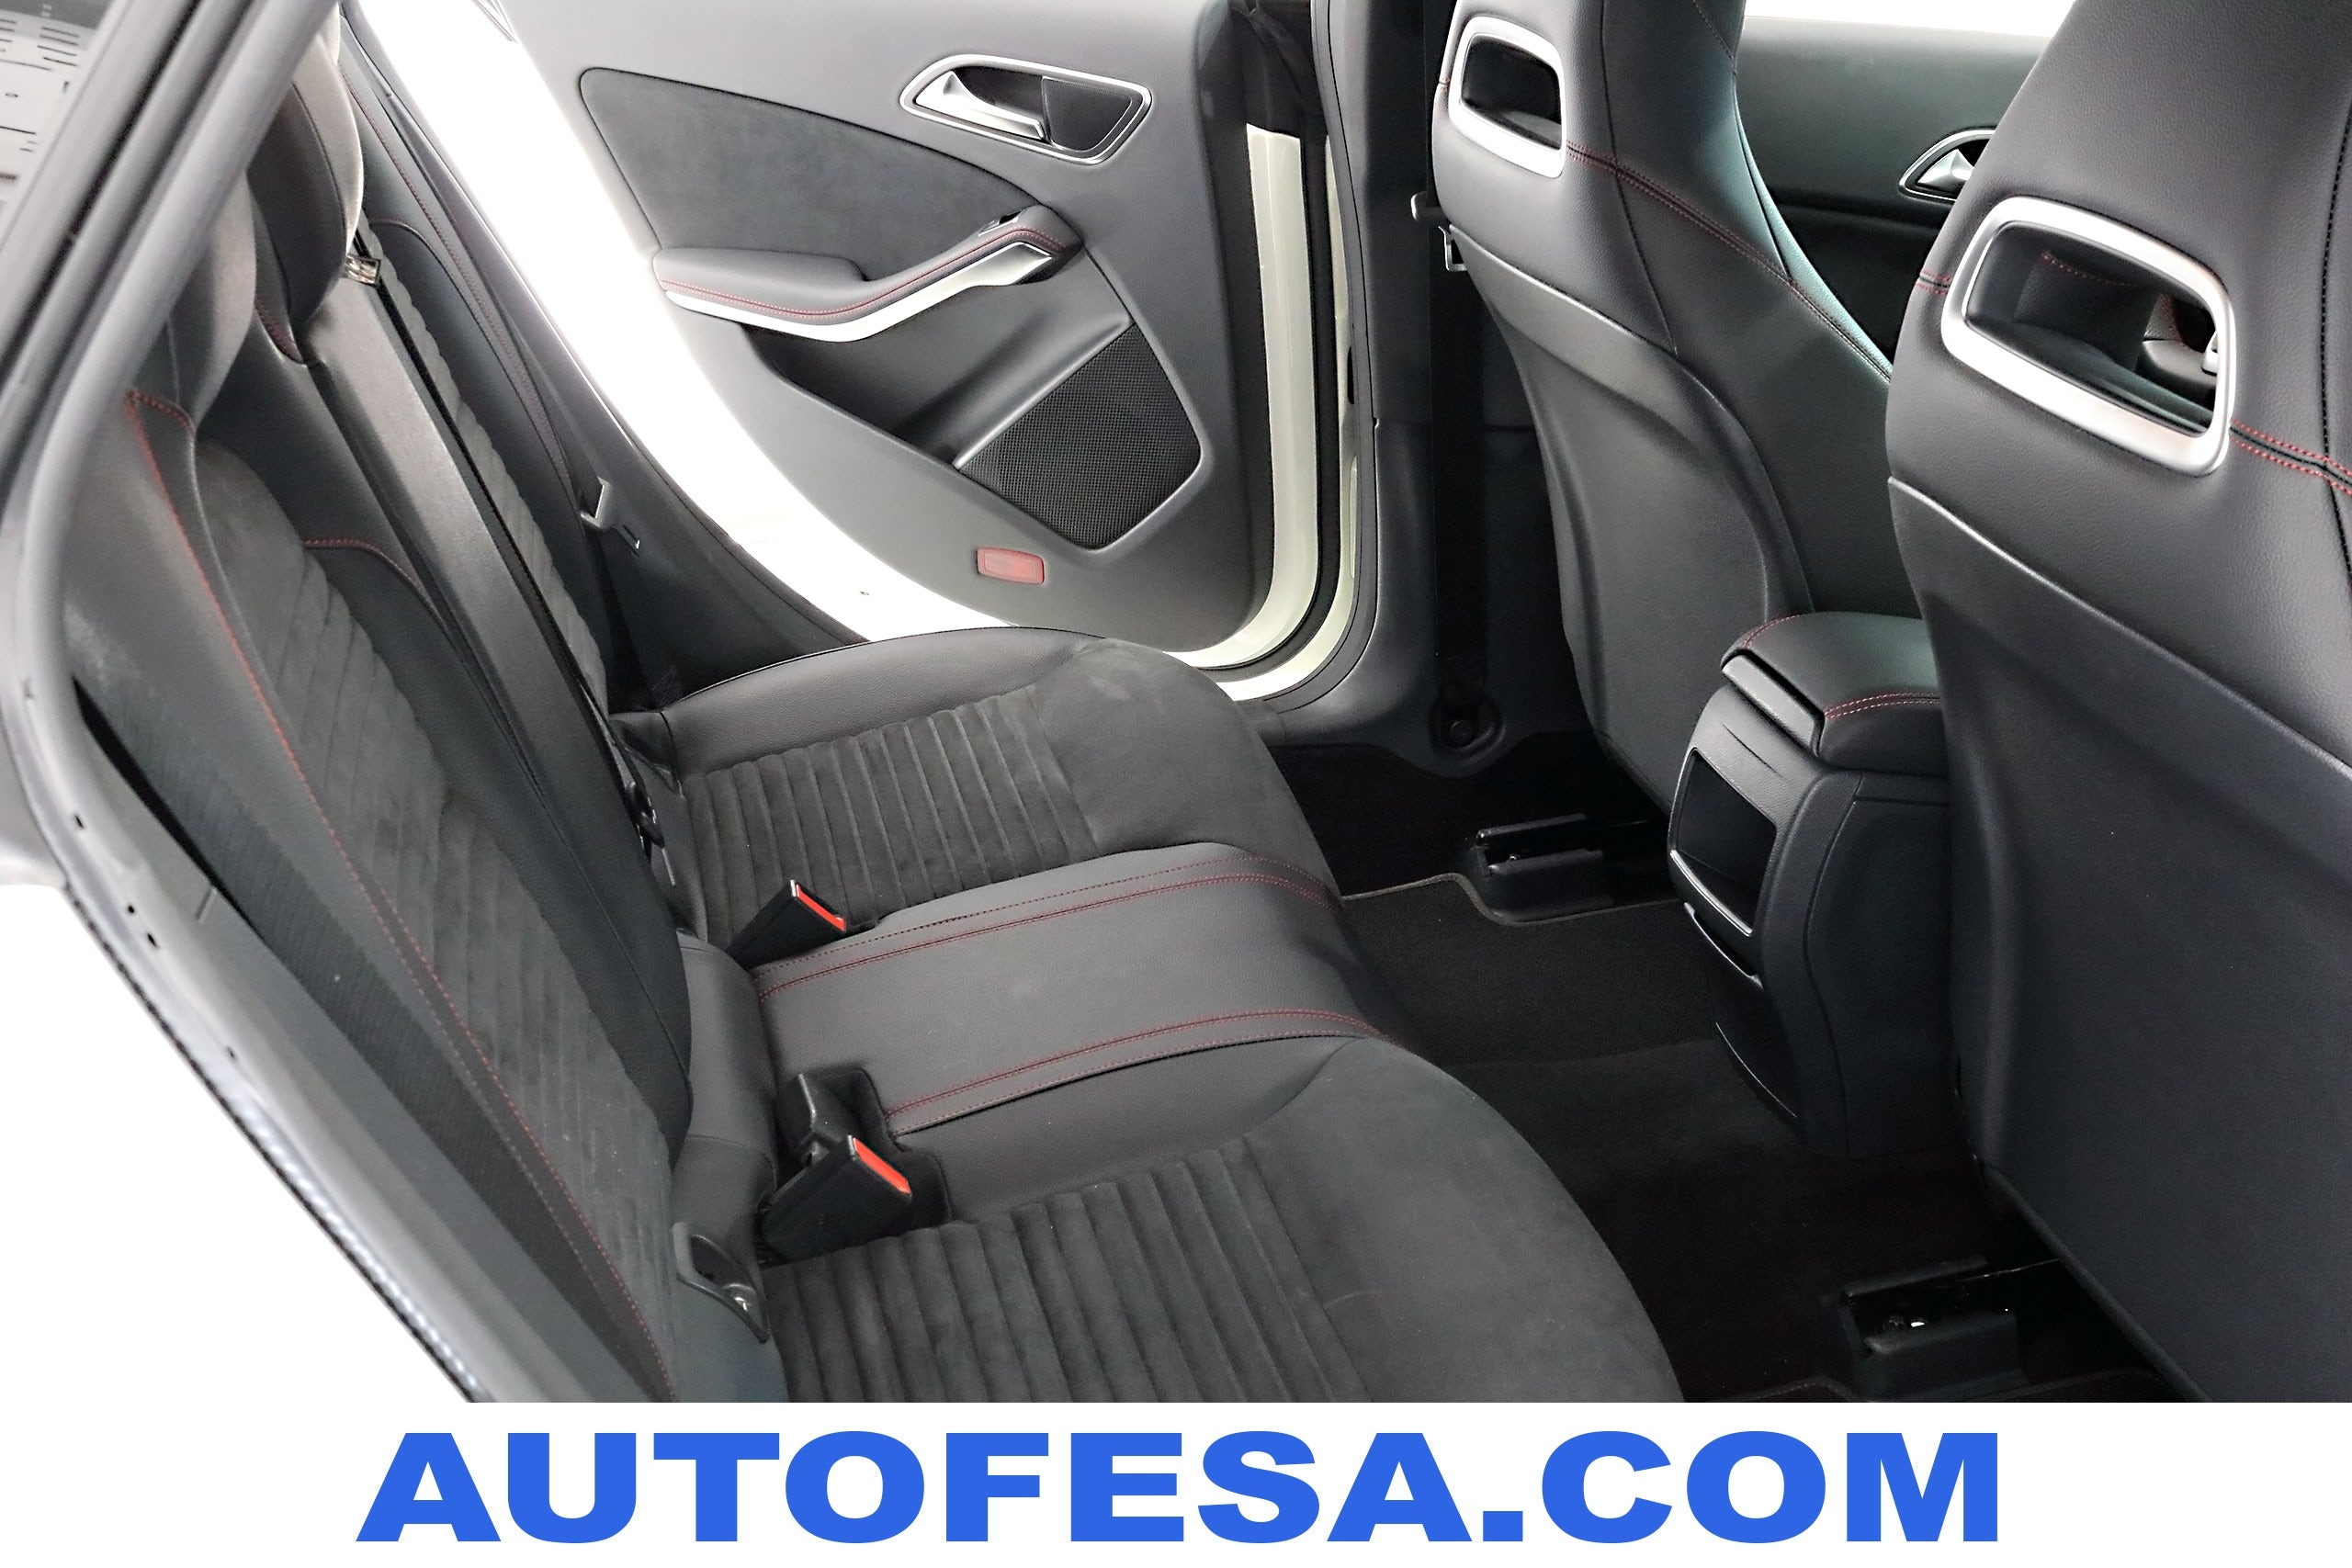 Mercedes-benz Cla 220 CLA 220 CDI 177cv 4p AMG Auto S/S - Foto 36